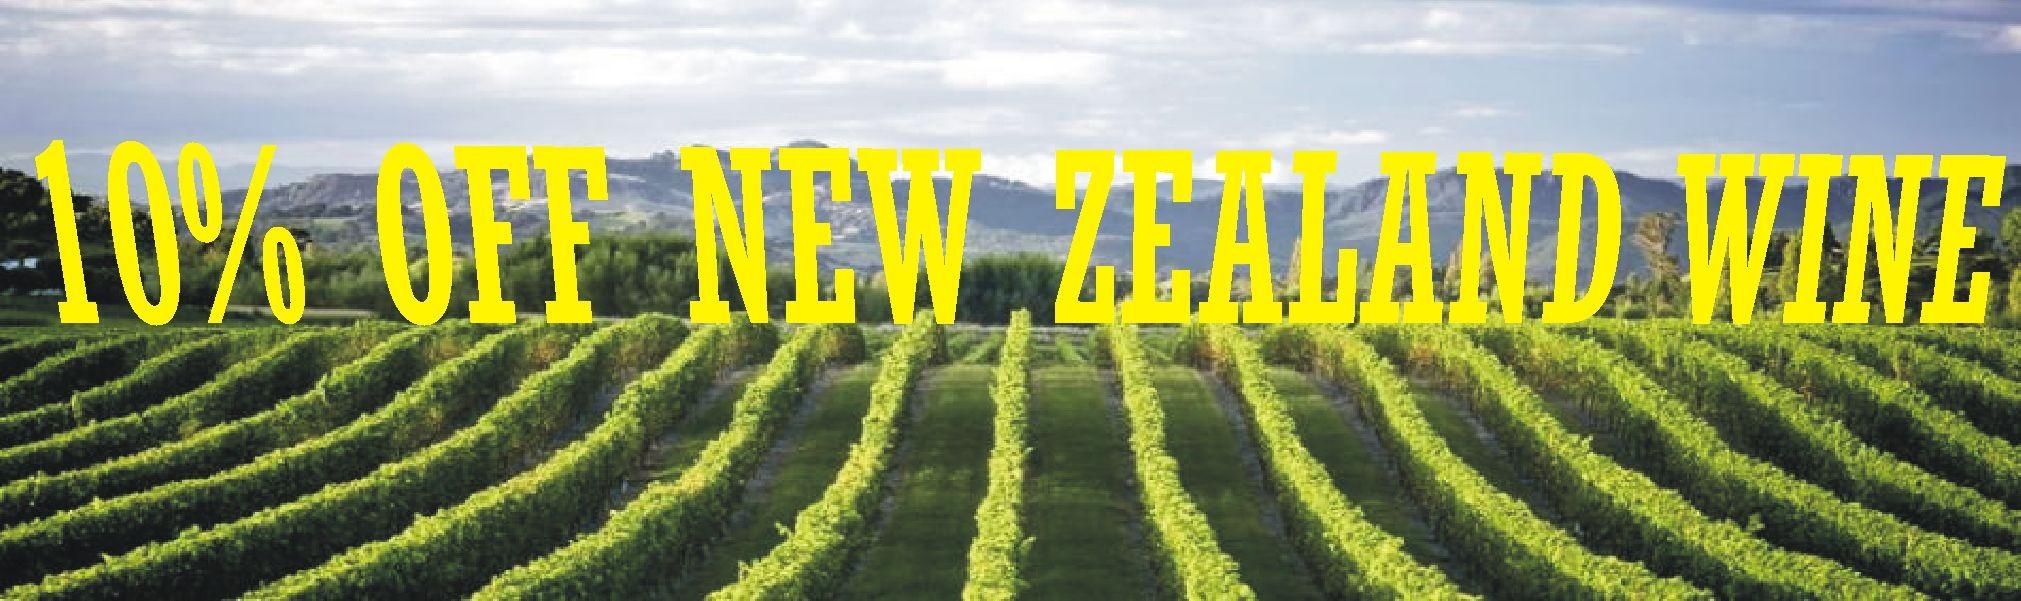 New Zealand Wine Sale